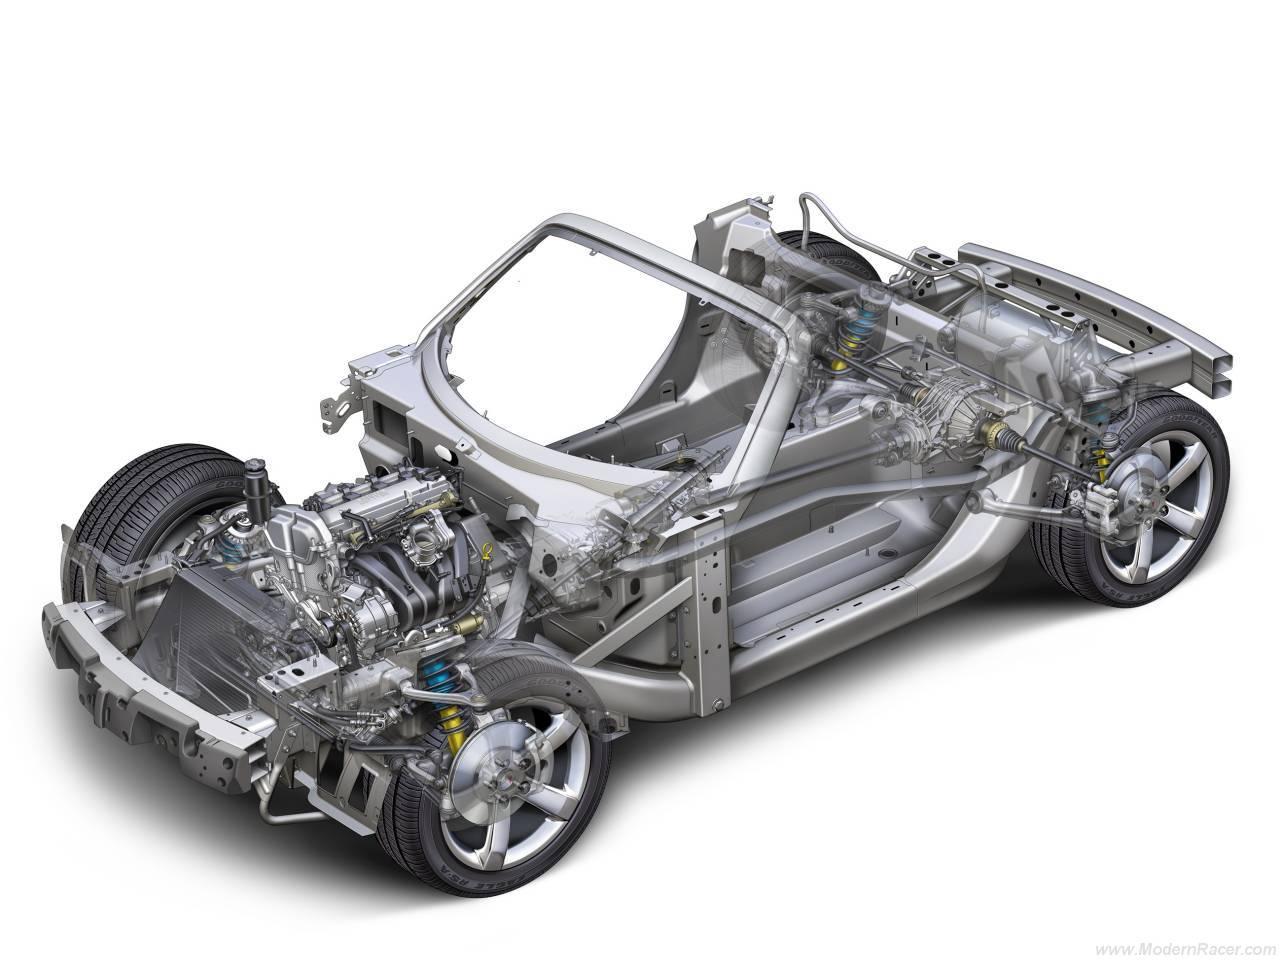 Design of car frame - Pontiac Solstice Cutaway Click To Enlarge